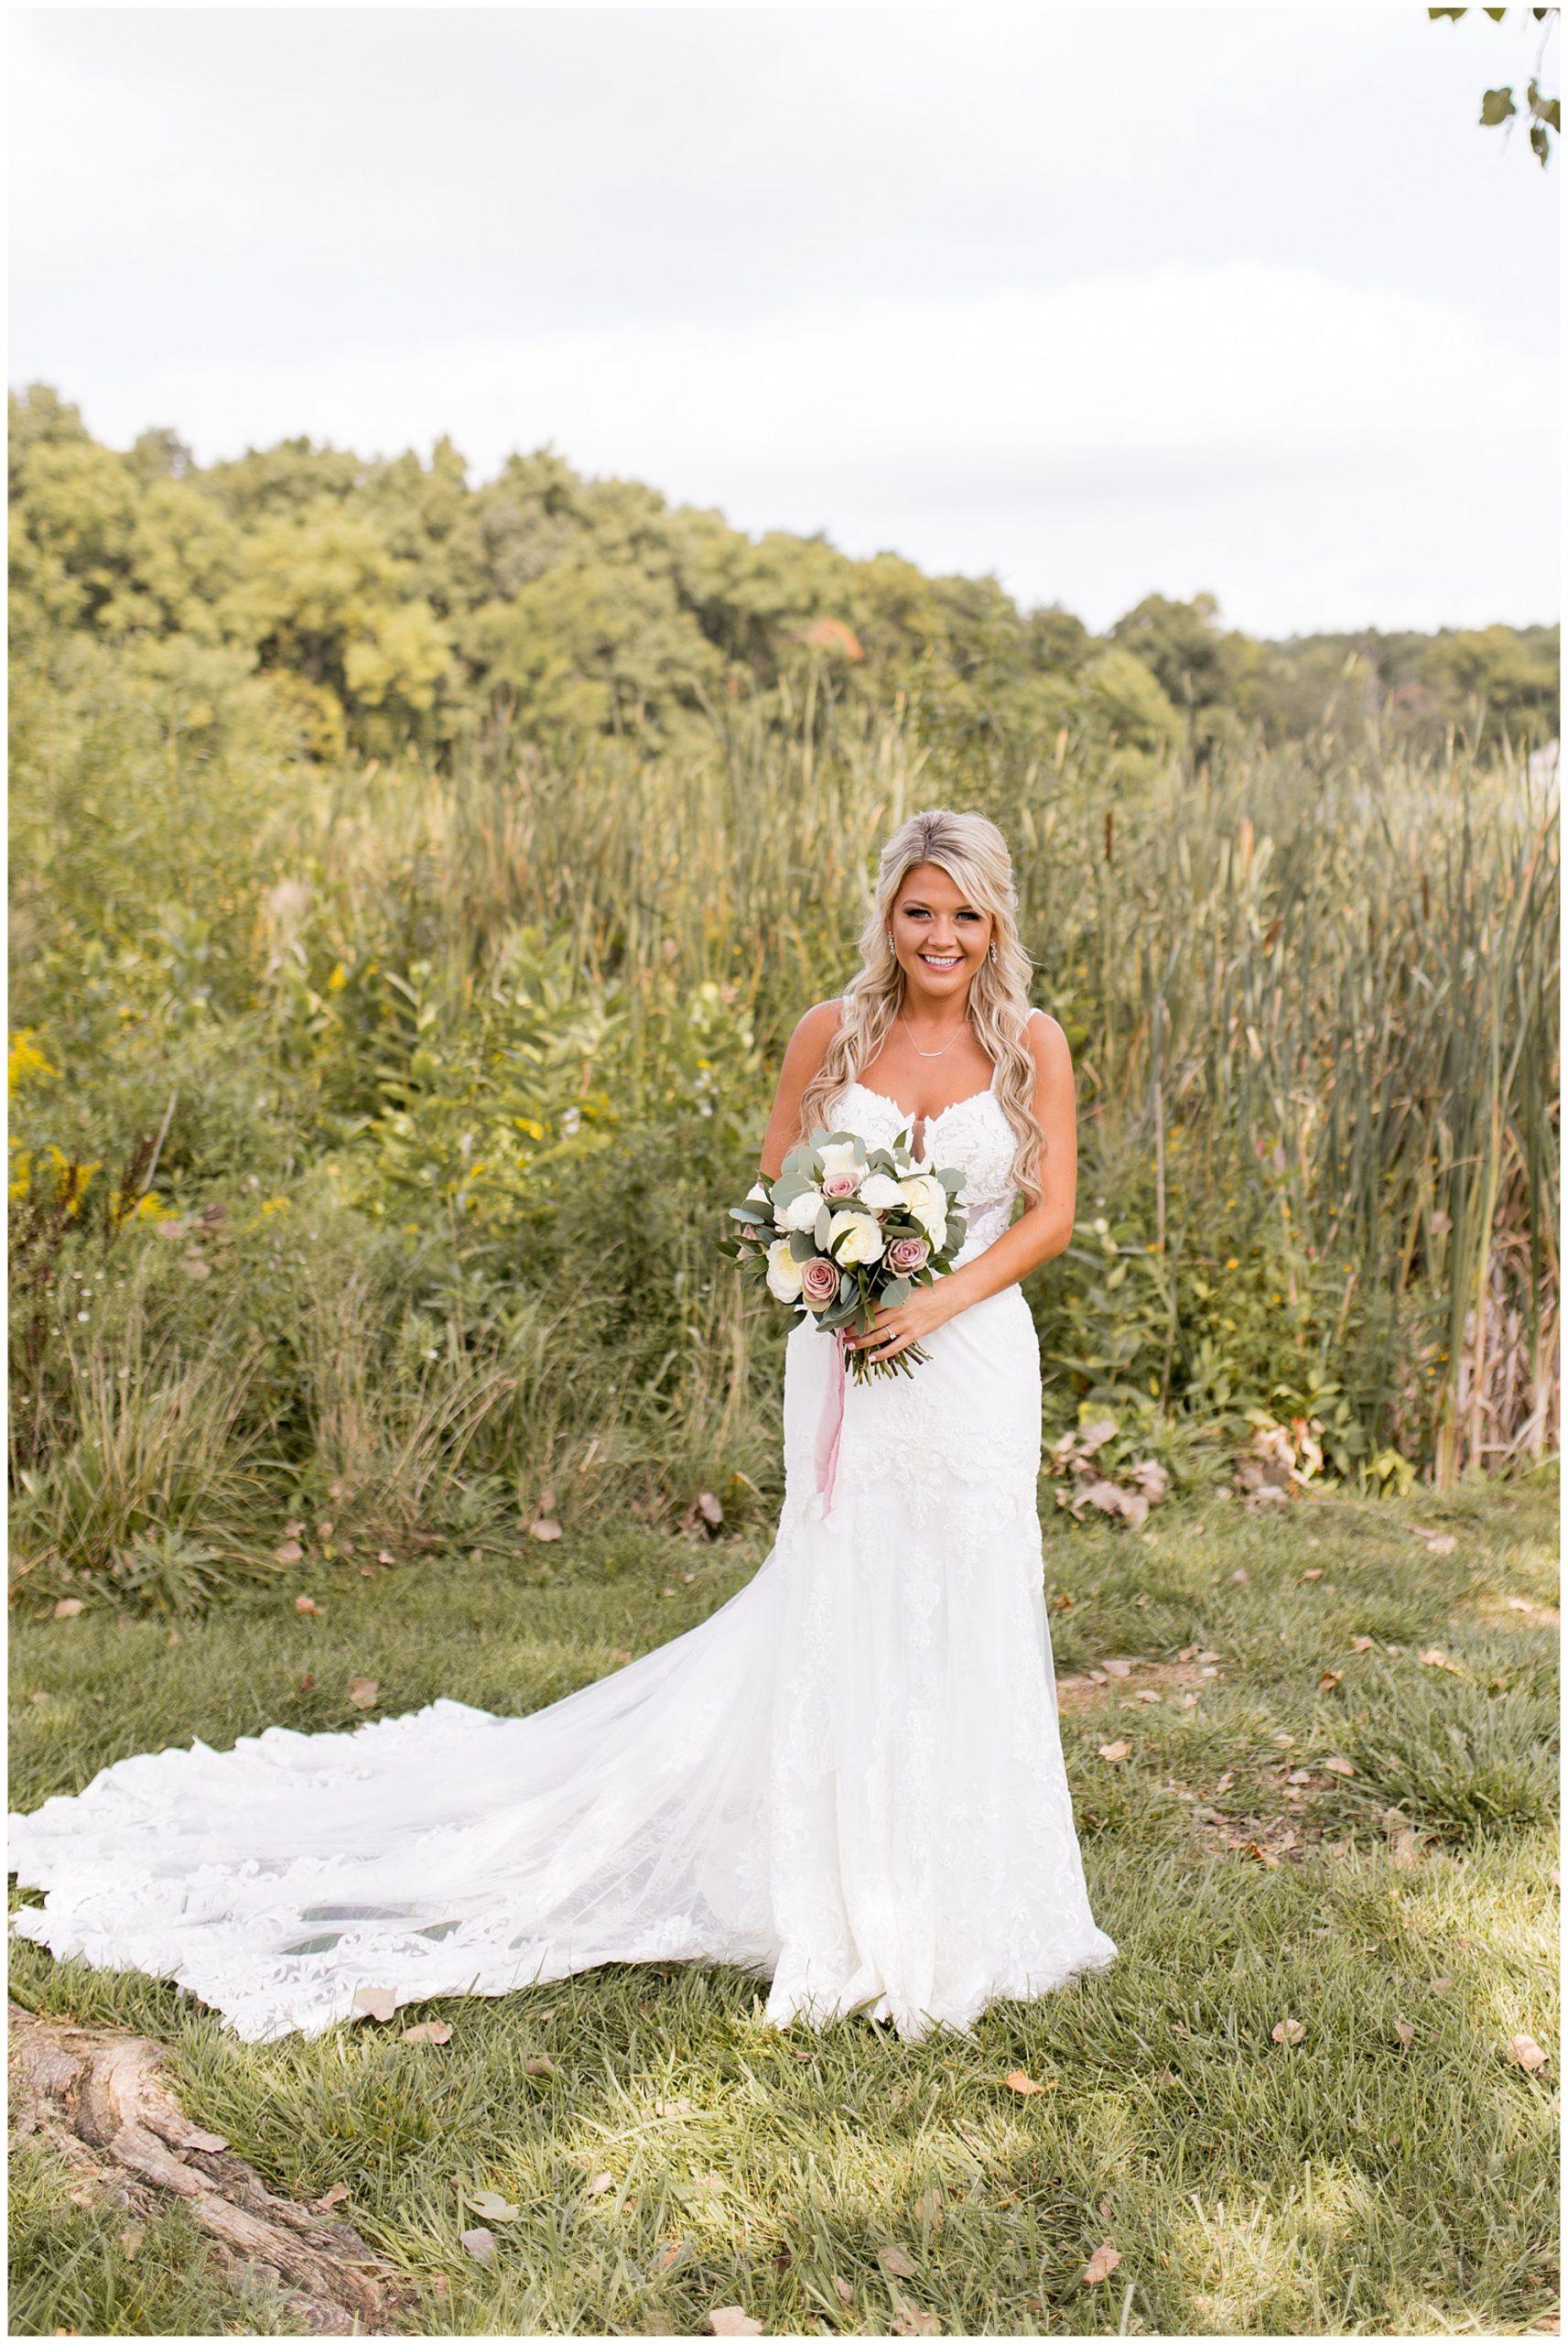 bride portraits at Union 12 wedding venue in Columbia City, Indiana